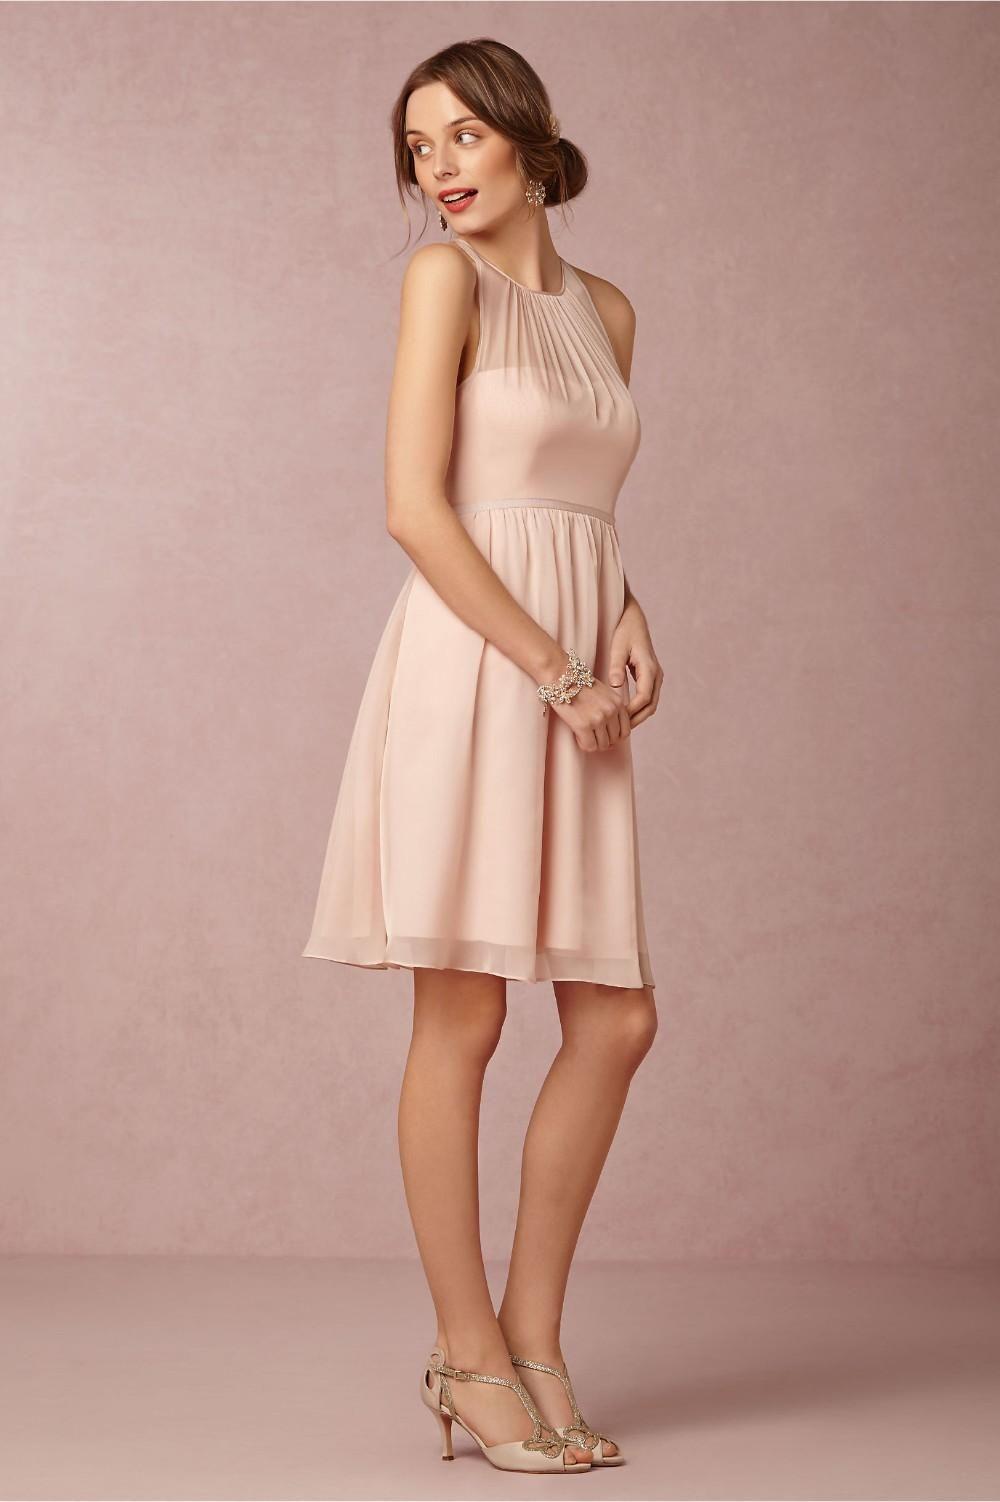 Popular chiffon blush pink bridesmaid dress short round neck a-line ...